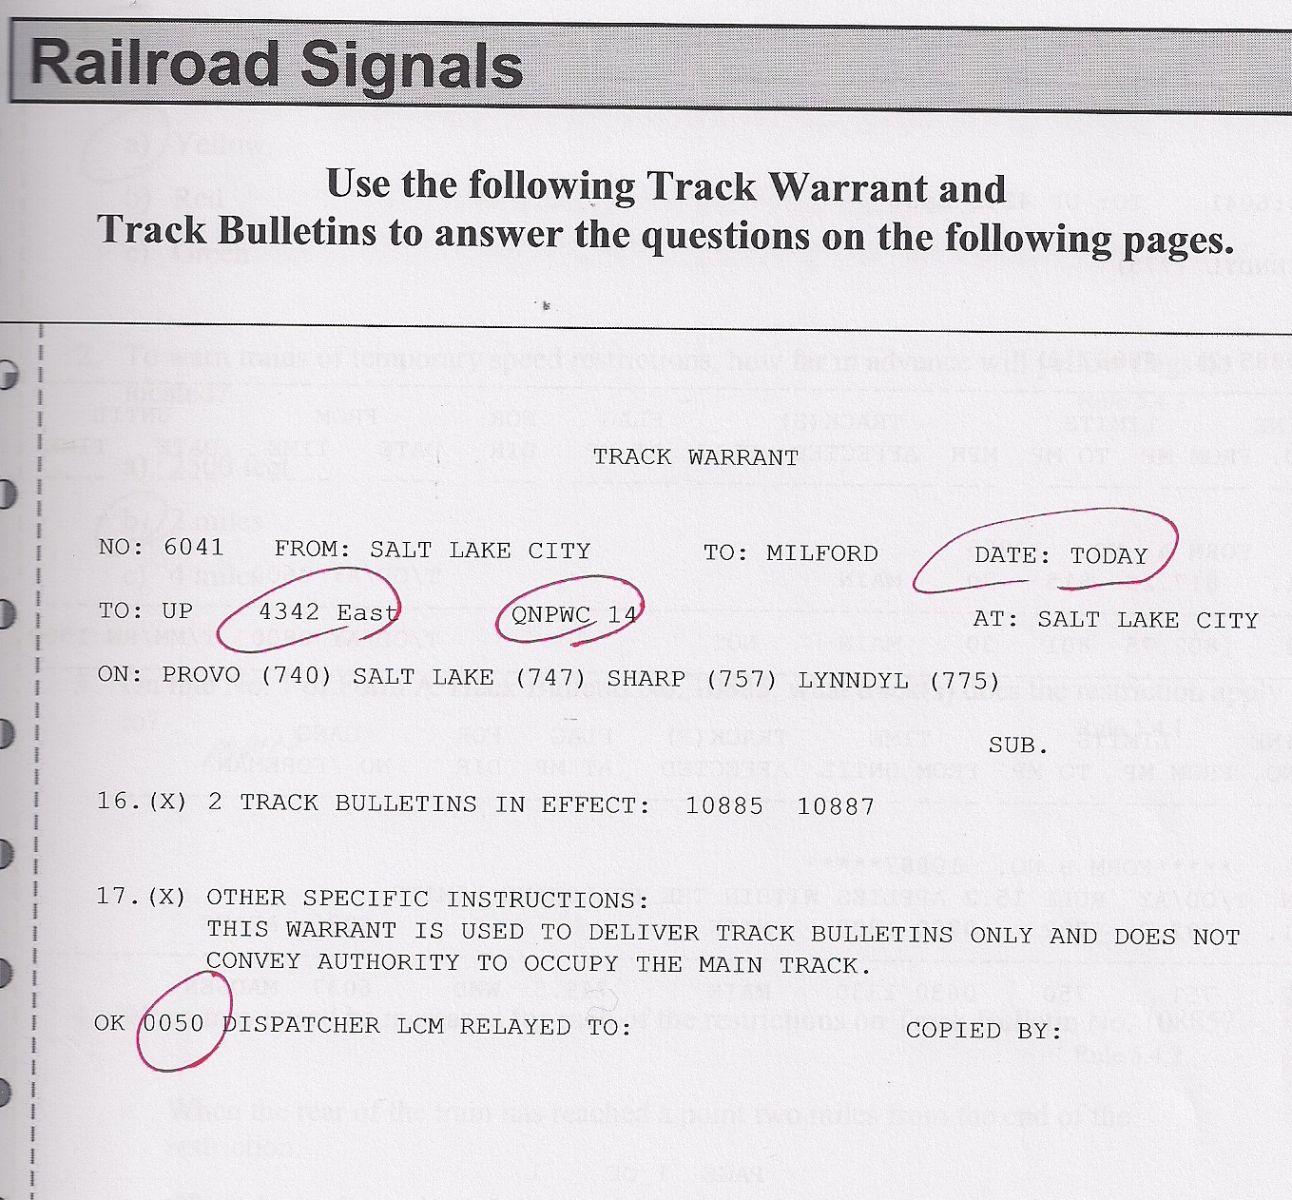 gcor railroad signals quiz 41 questions proprofs quiz rh proprofs com Gcor 7th Edition Gcor Manual for Railroads